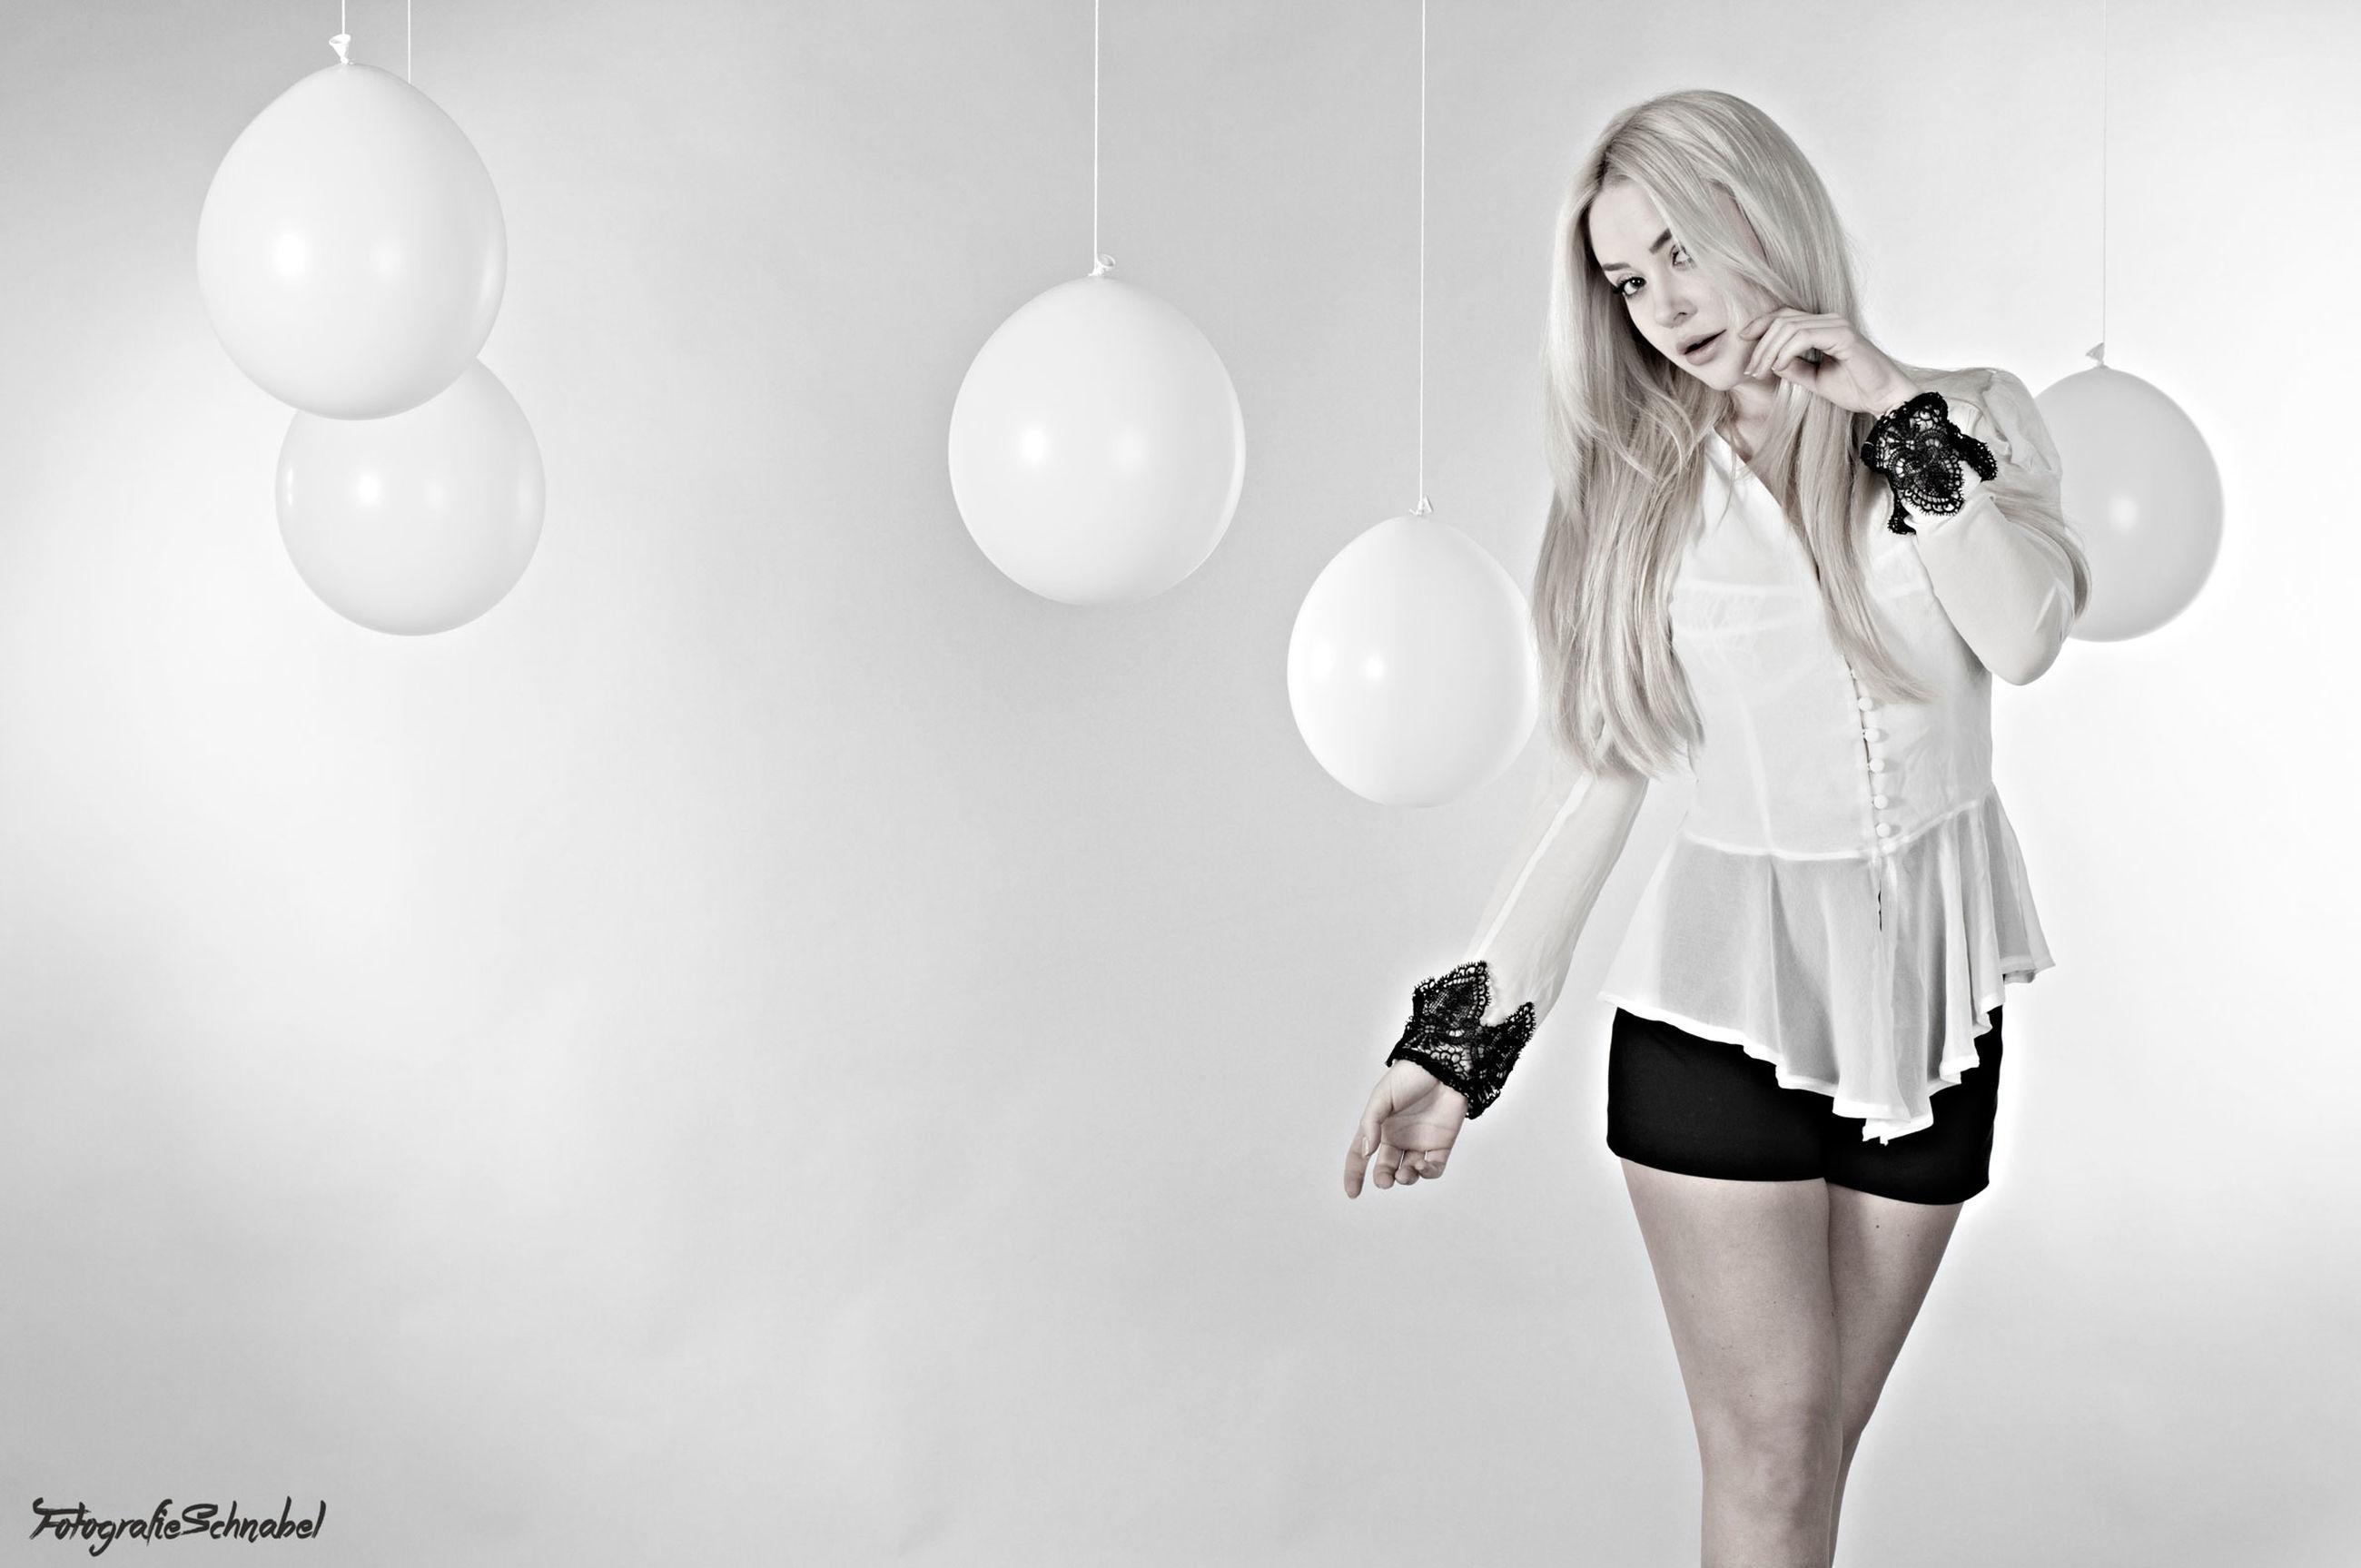 indoors, standing, casual clothing, holding, enjoyment, studio shot, young adult, arrangement